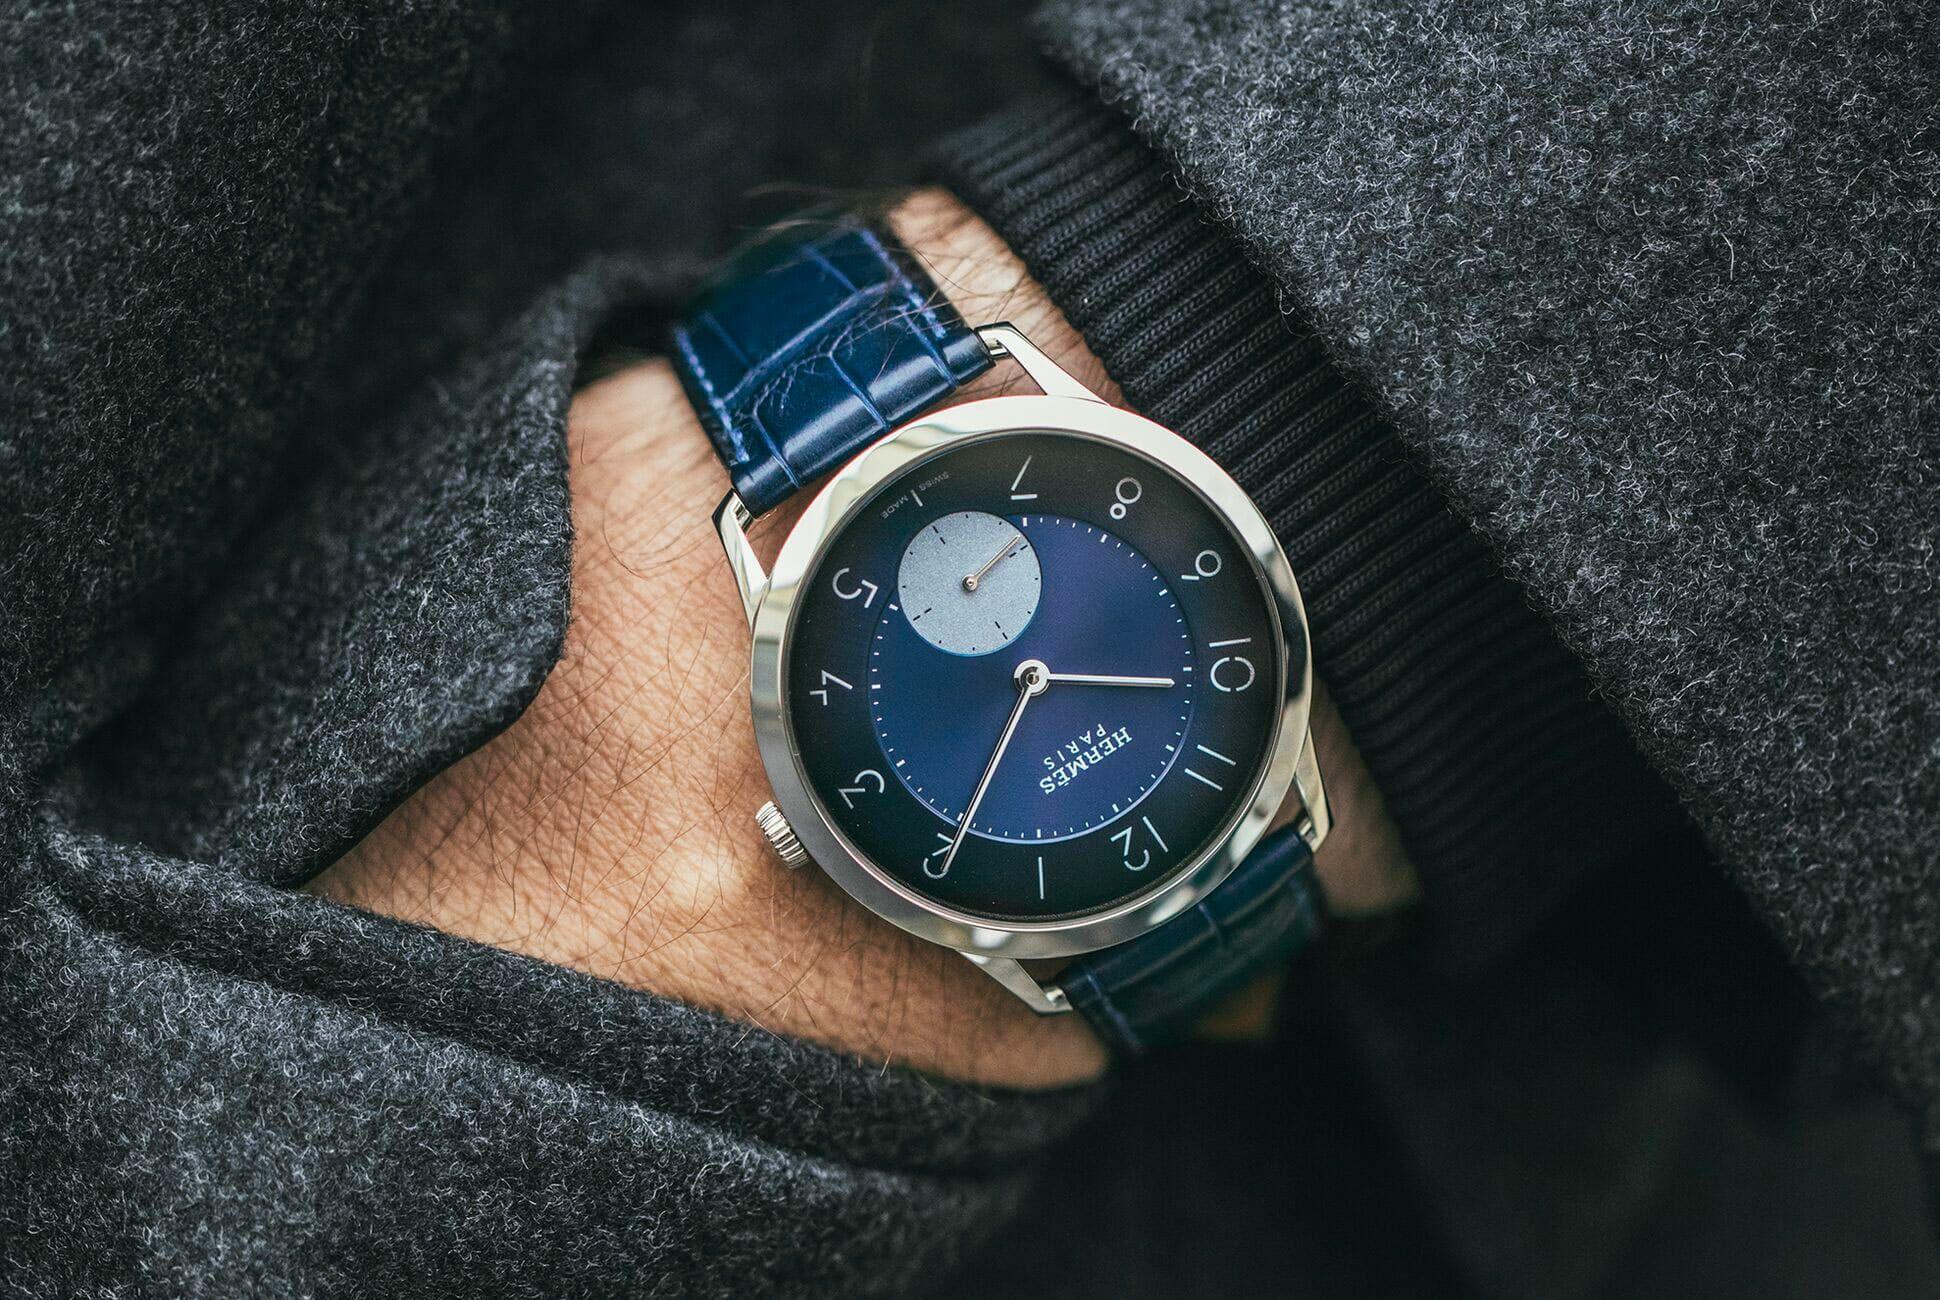 Hodinkee-X-Hermes-Watches-gear-patrol-slide-03